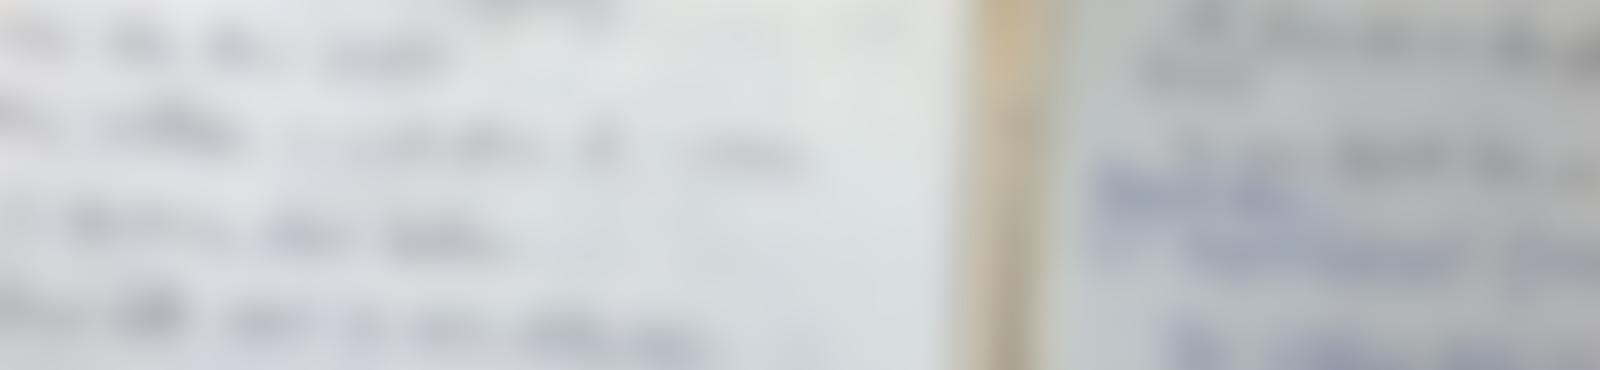 Blurred b2049a44 e6e4 4feb 91b4 1954712763b8